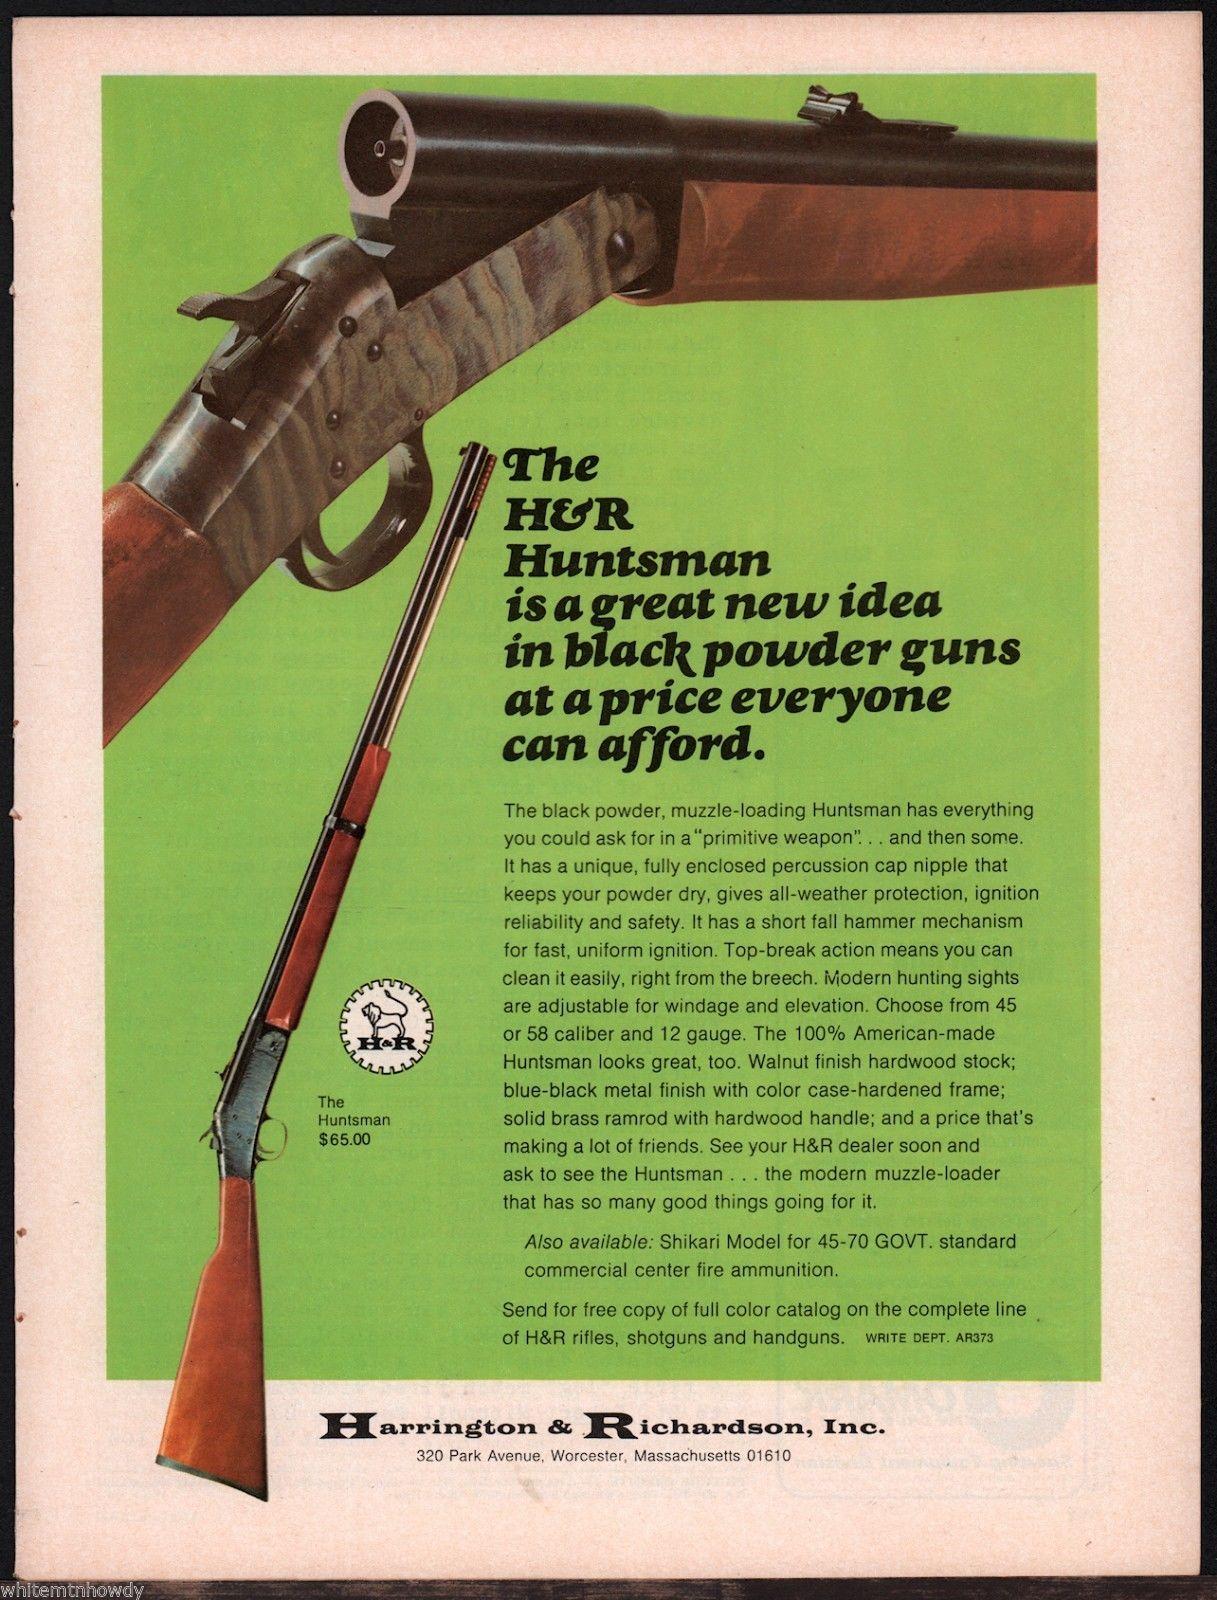 1973 Harrington Richardson Huntsman Ad Other Collectibles At Gunbroker Com Black Powder Guns Guns Print Ads